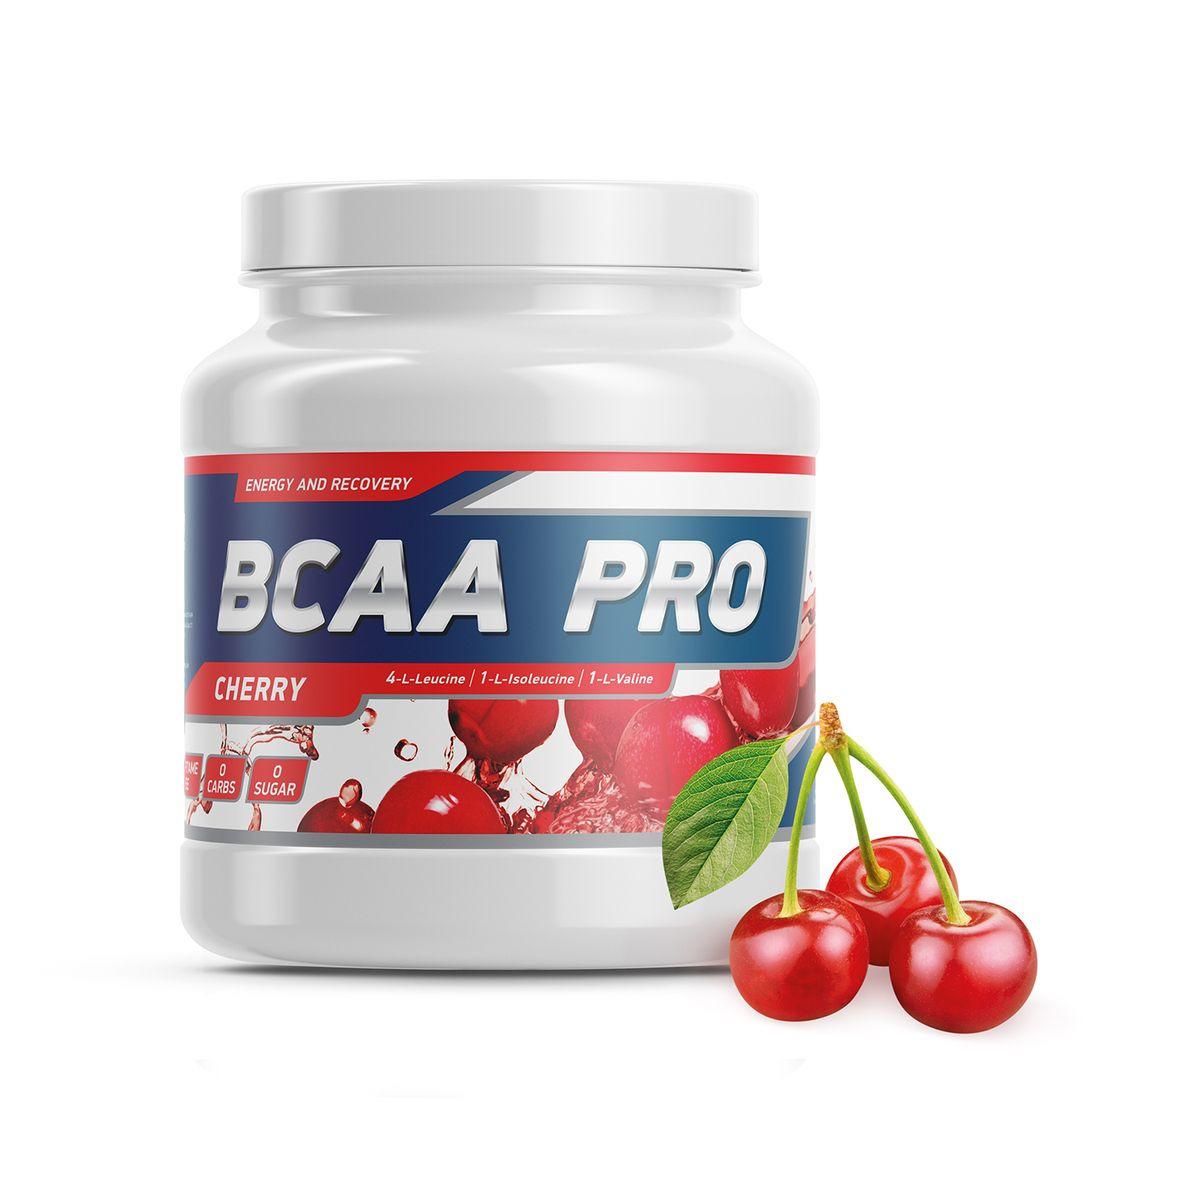 Комплекс аминокислот Geneticlab Nutrition BCAA 2:1:1, со вкусом вишня-кола